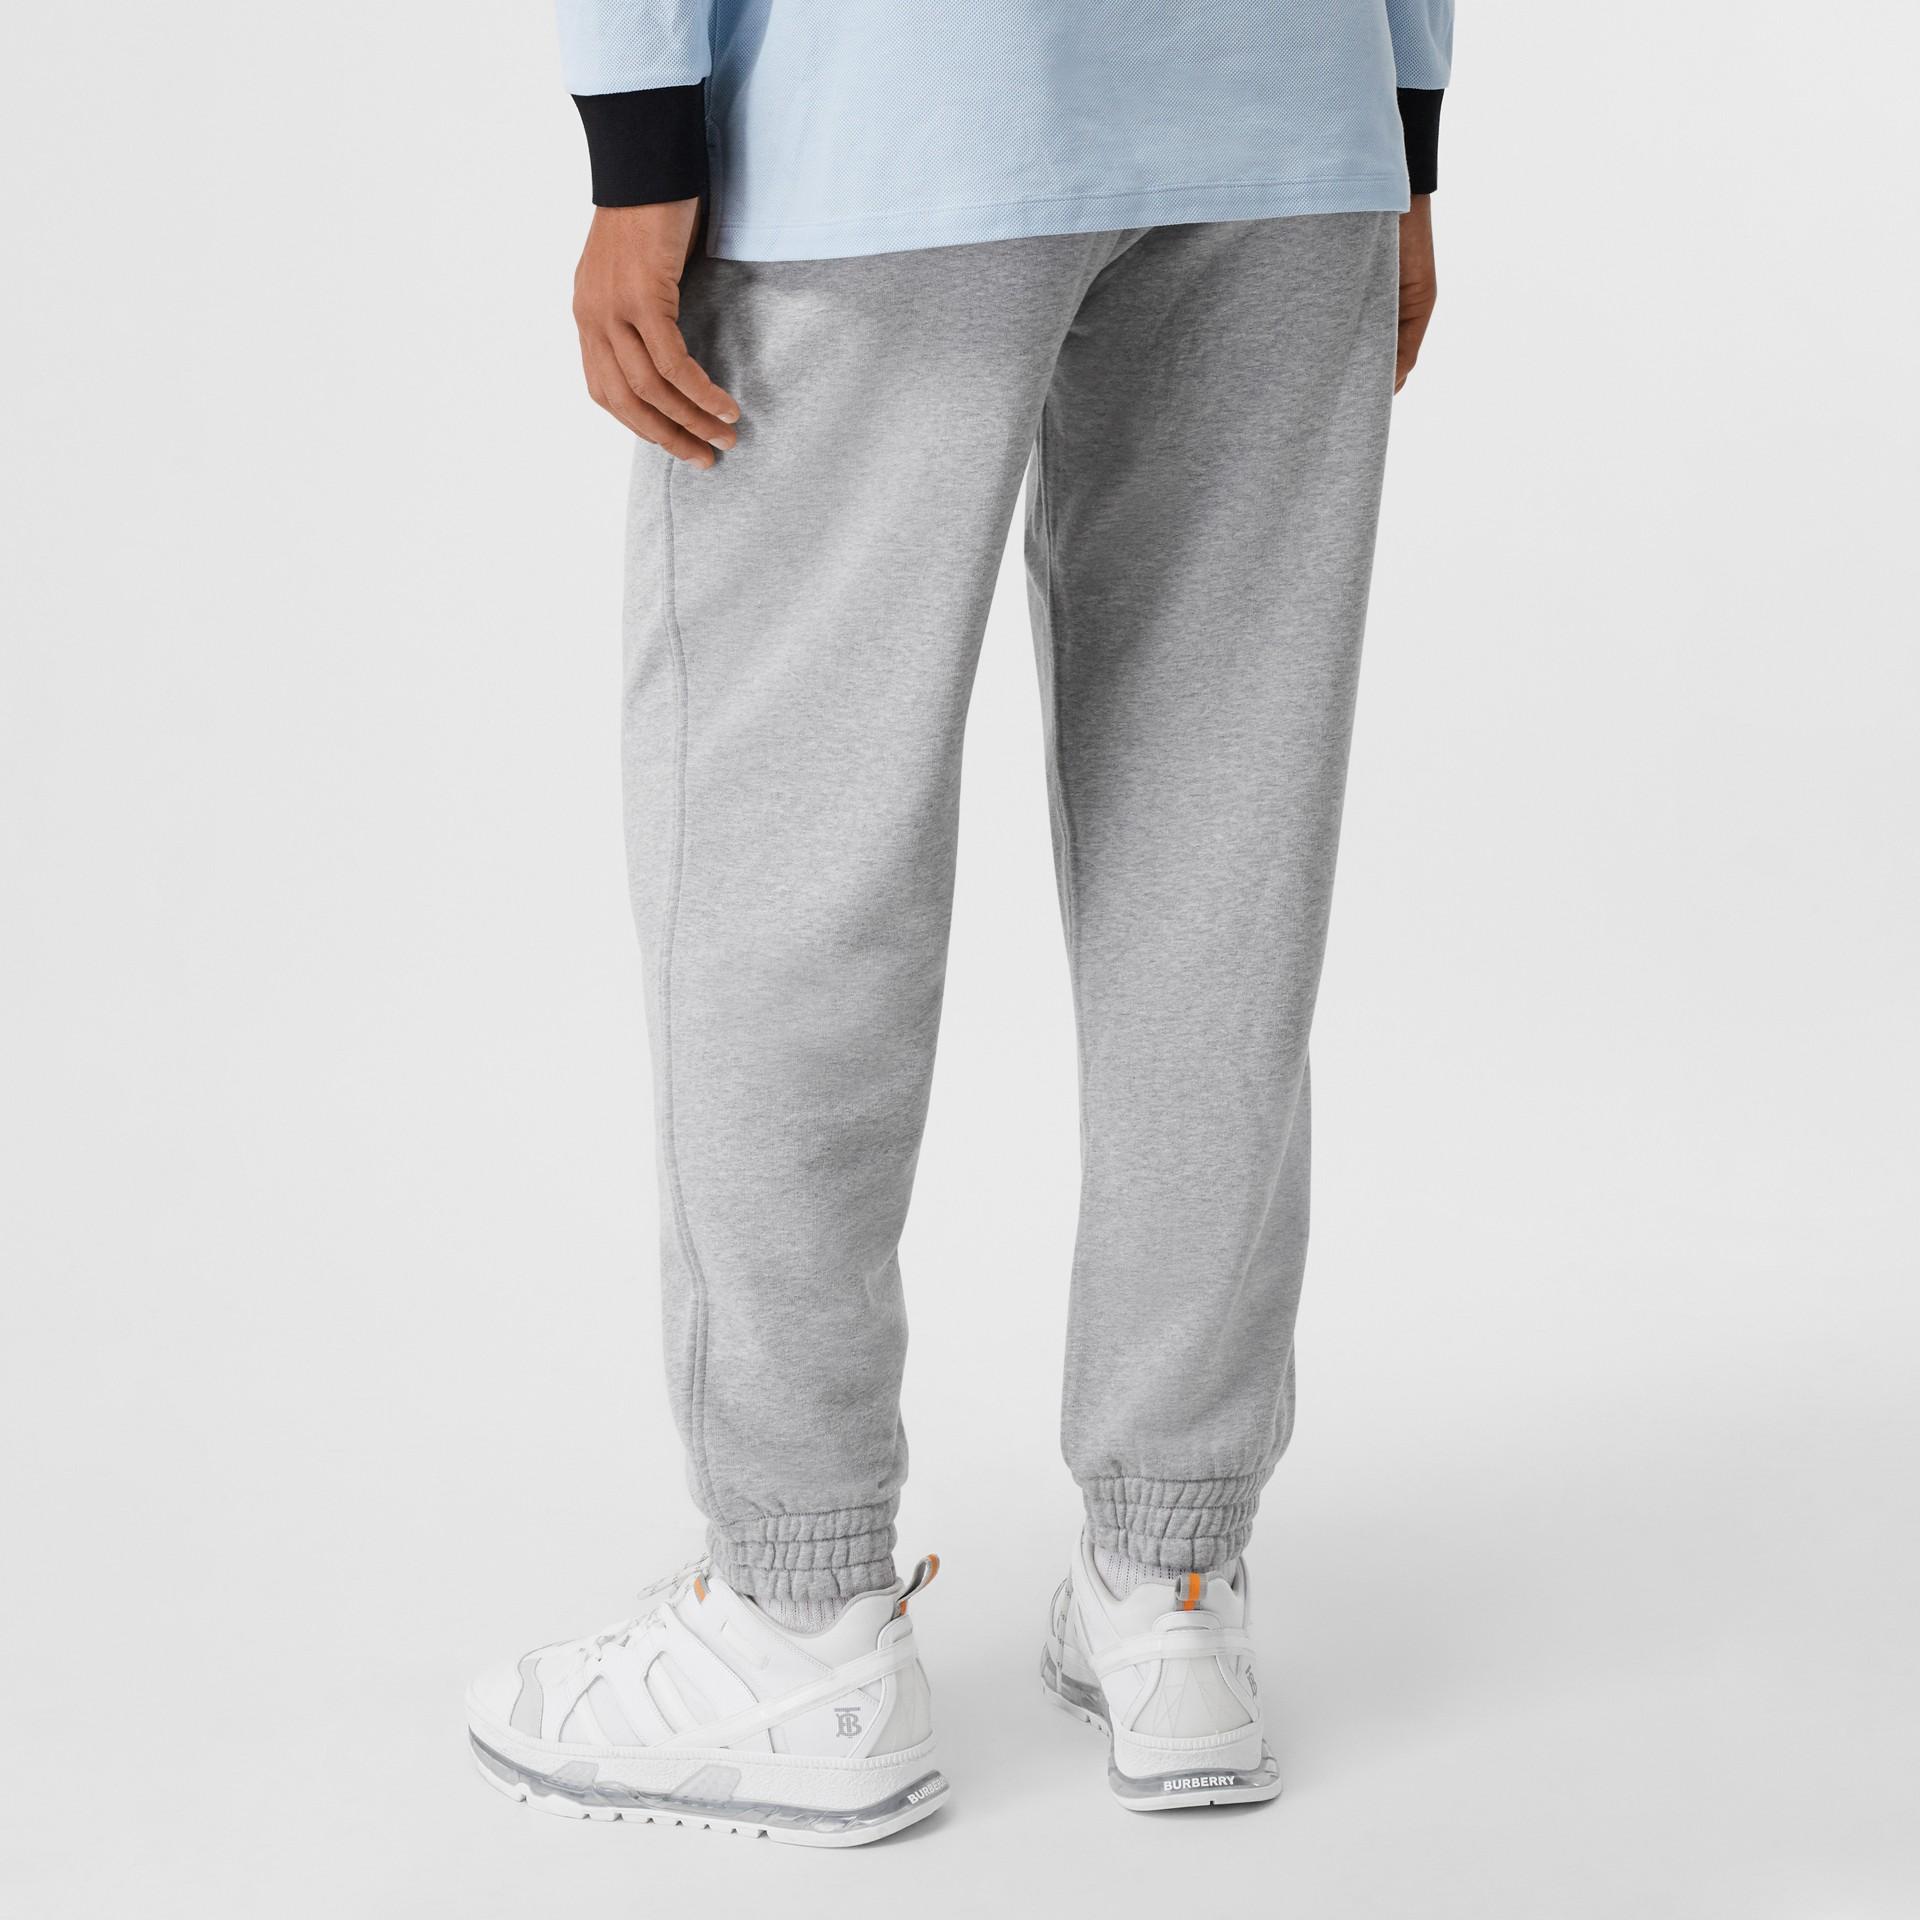 Logo Appliqué Cotton Trackpants in Pale Grey Melange - Men | Burberry United States - gallery image 2